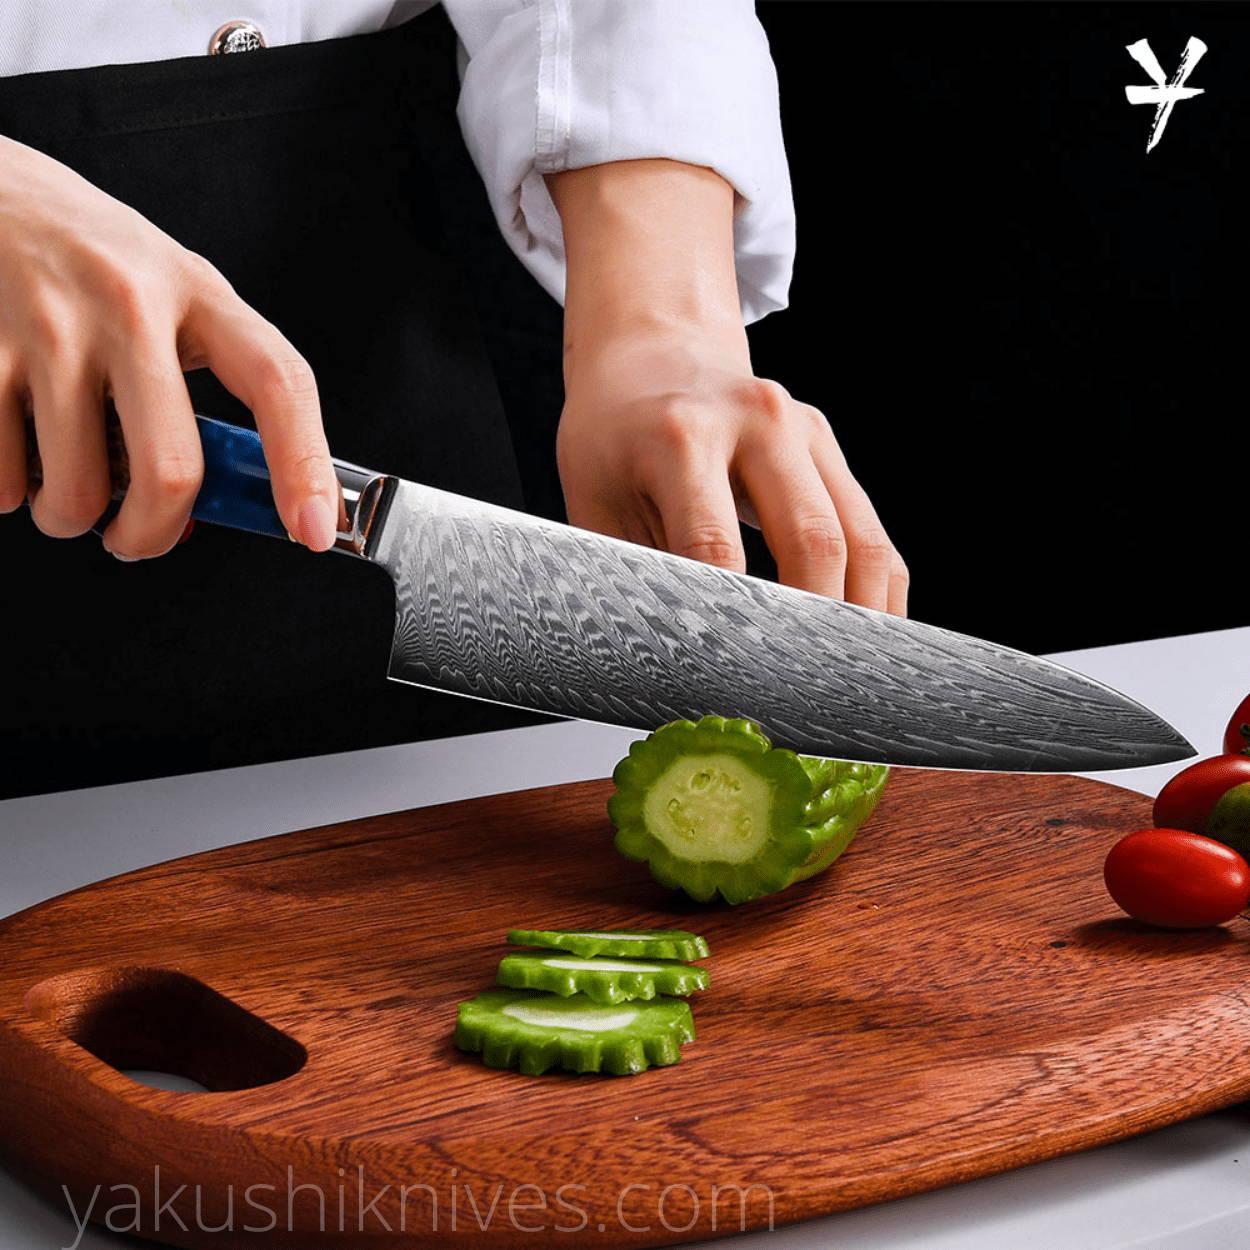 Damascus steel knife, japanese chef knife, best japanese kitchen knife, damascus chef knife